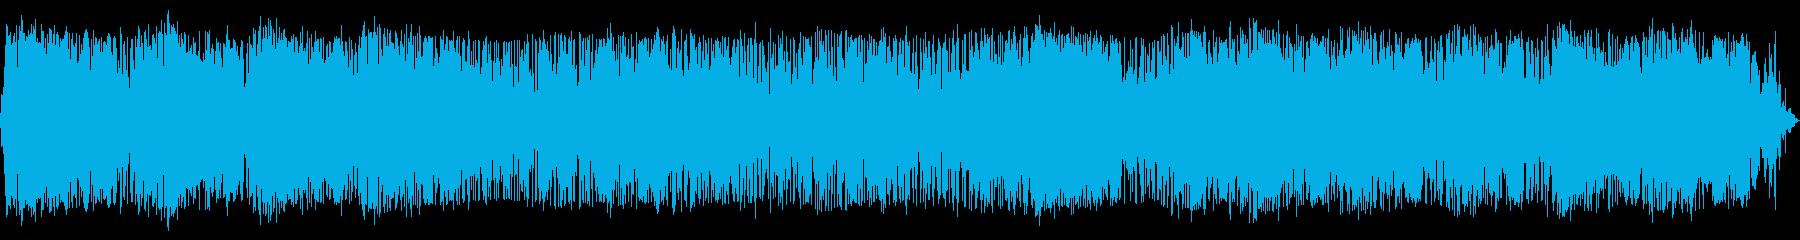 F1マシンをふかすの再生済みの波形